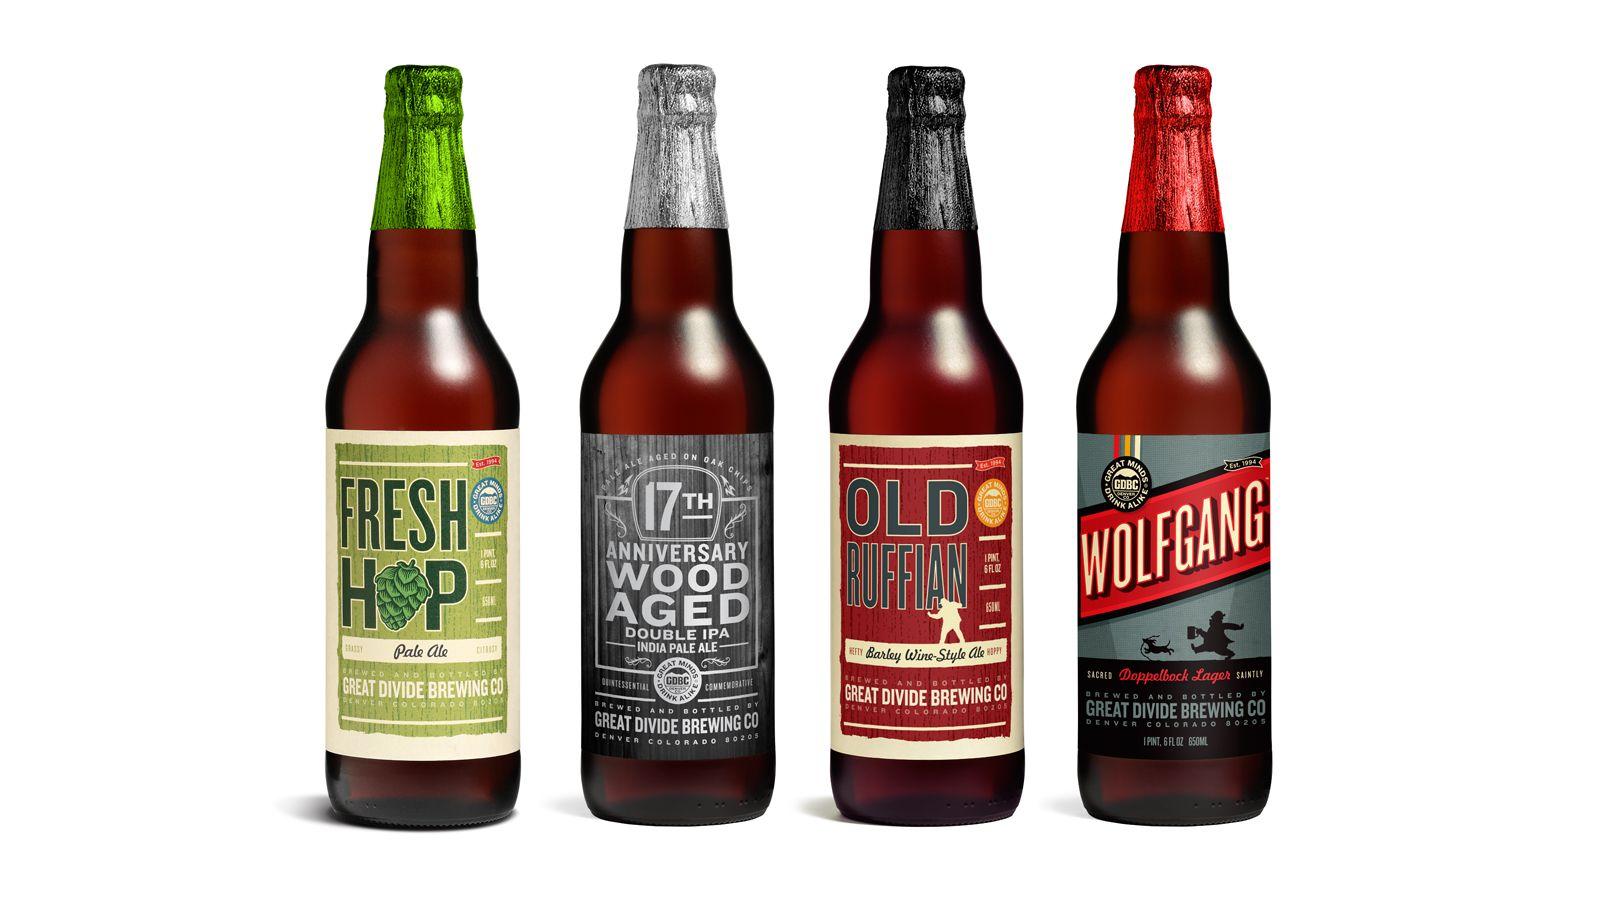 Cultivator Advertising And Design Denver Colorado Denver Advertising Agency Denver Design Beer Design Beer Packaging Design Beer Packaging